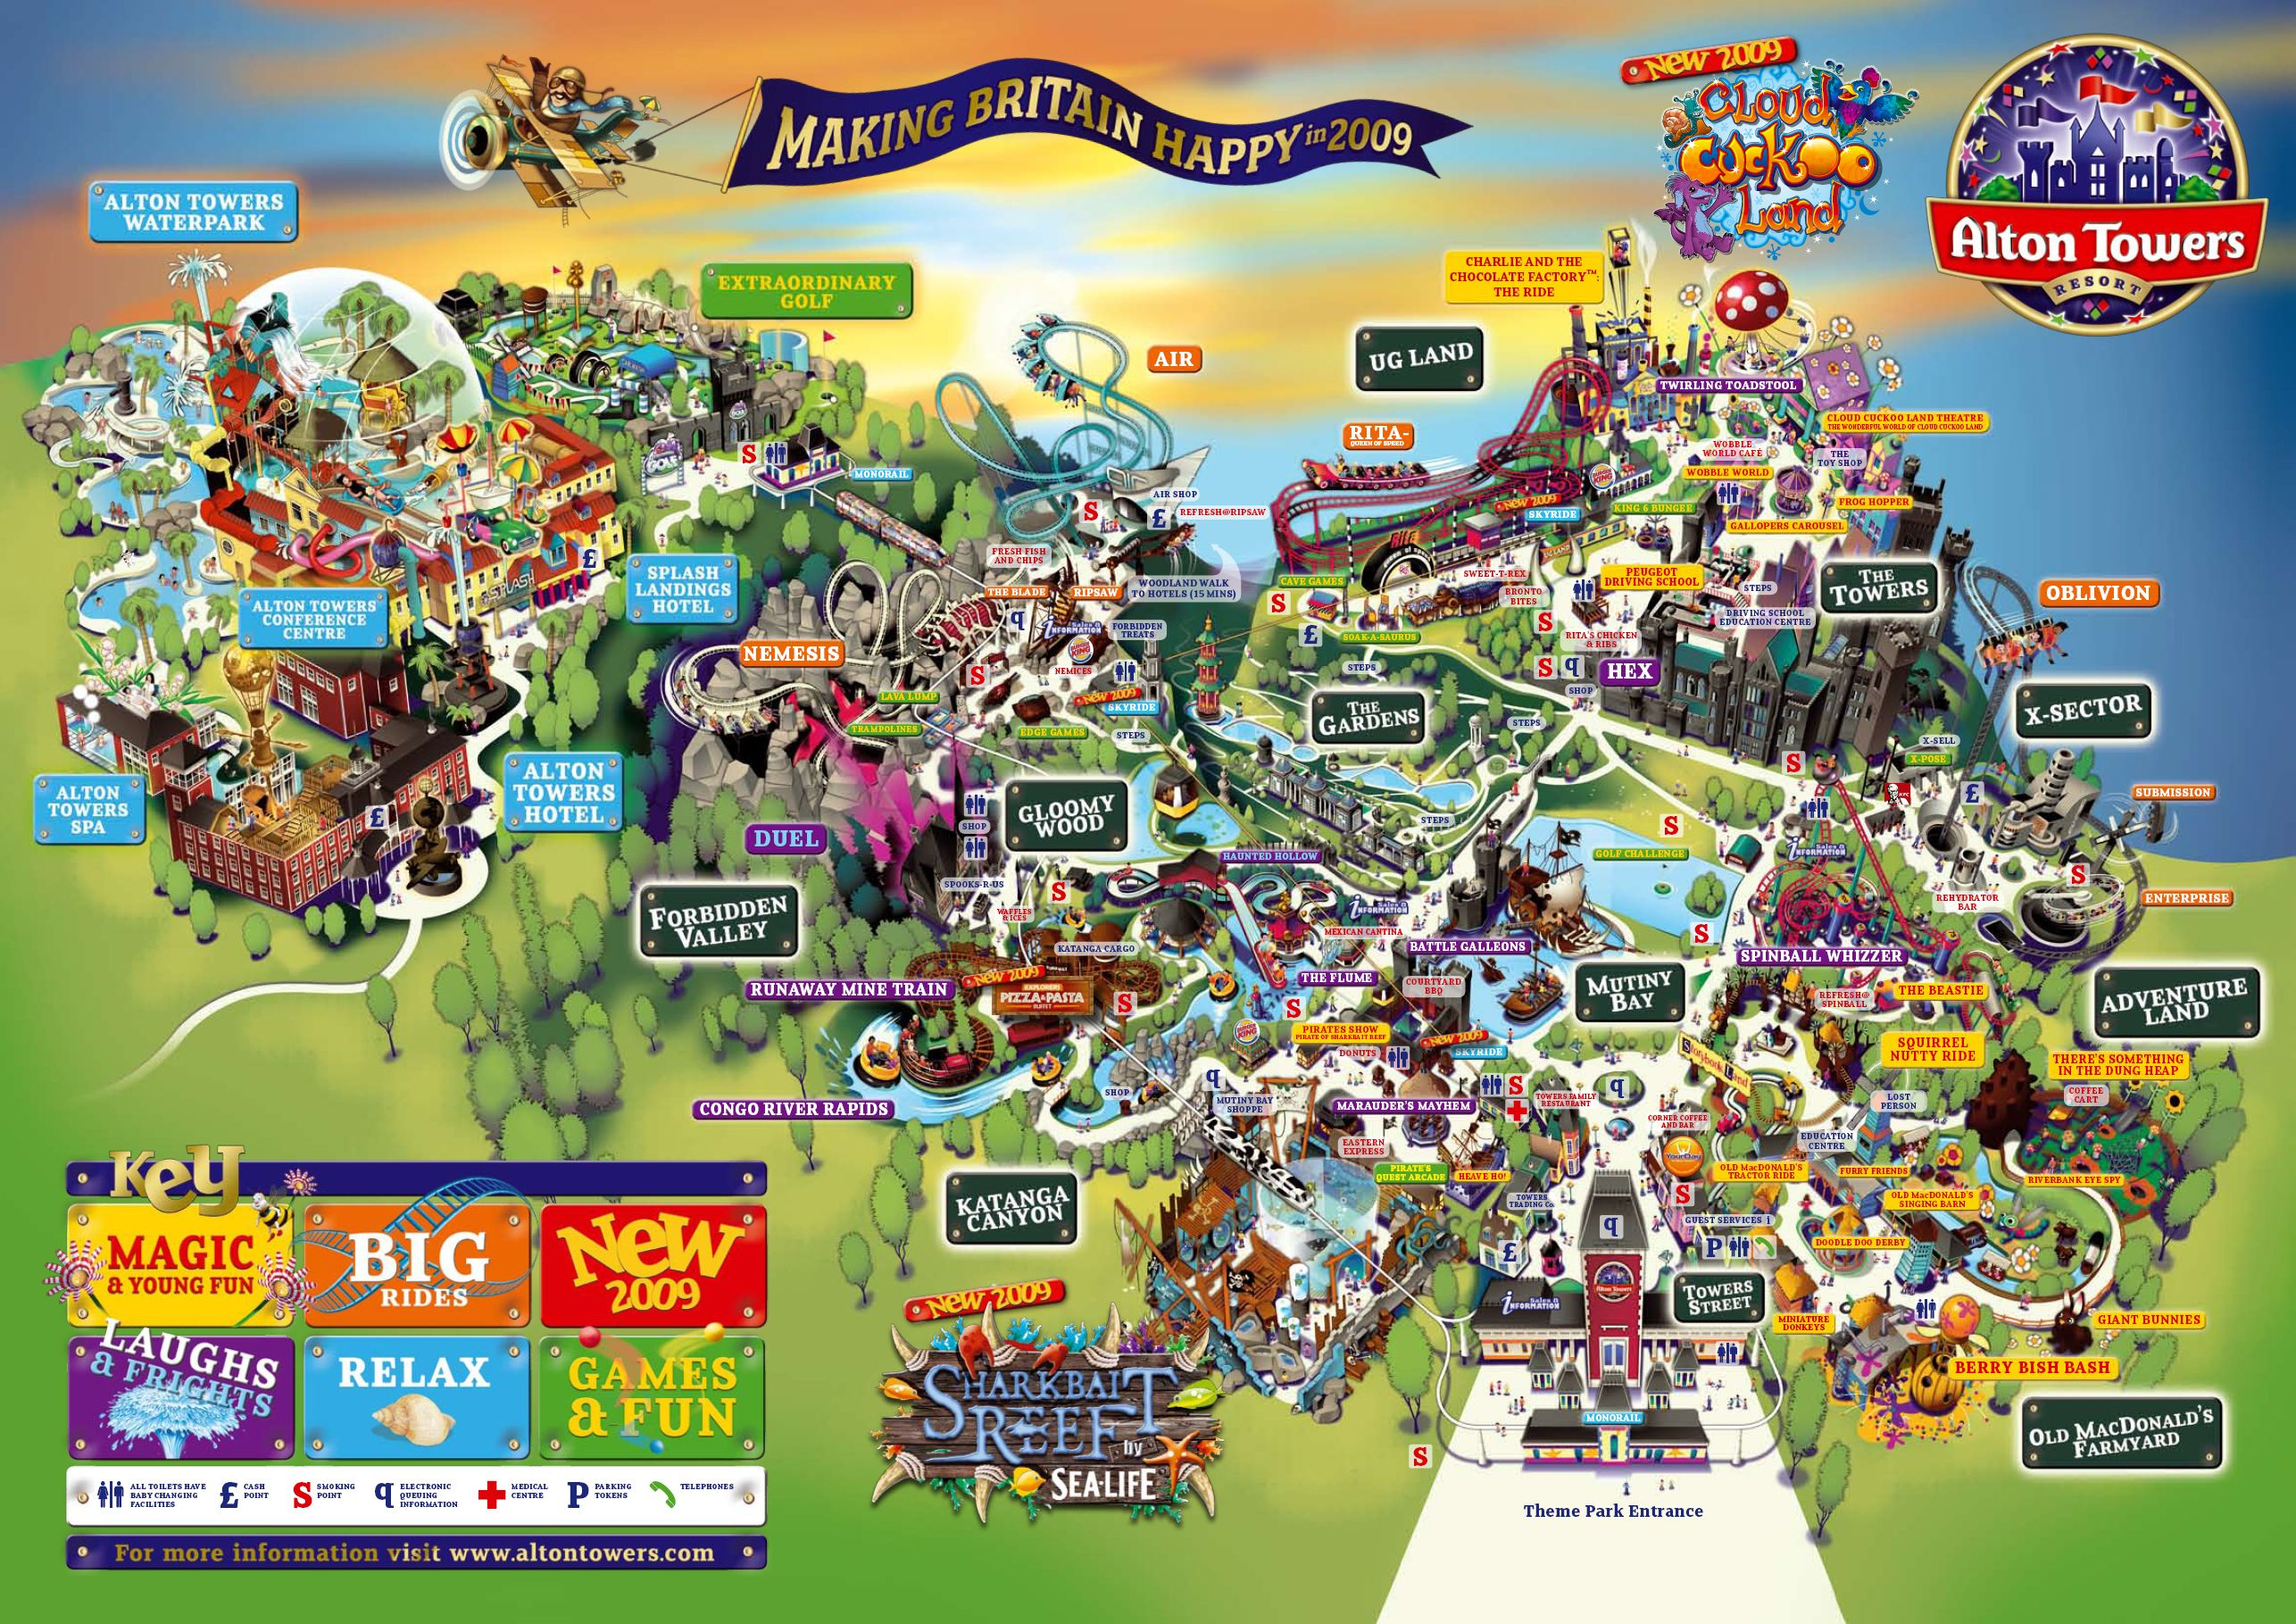 Http www alton towers co uk pages theme park - Alton Towers The Bestest Theme Park Ive Been To